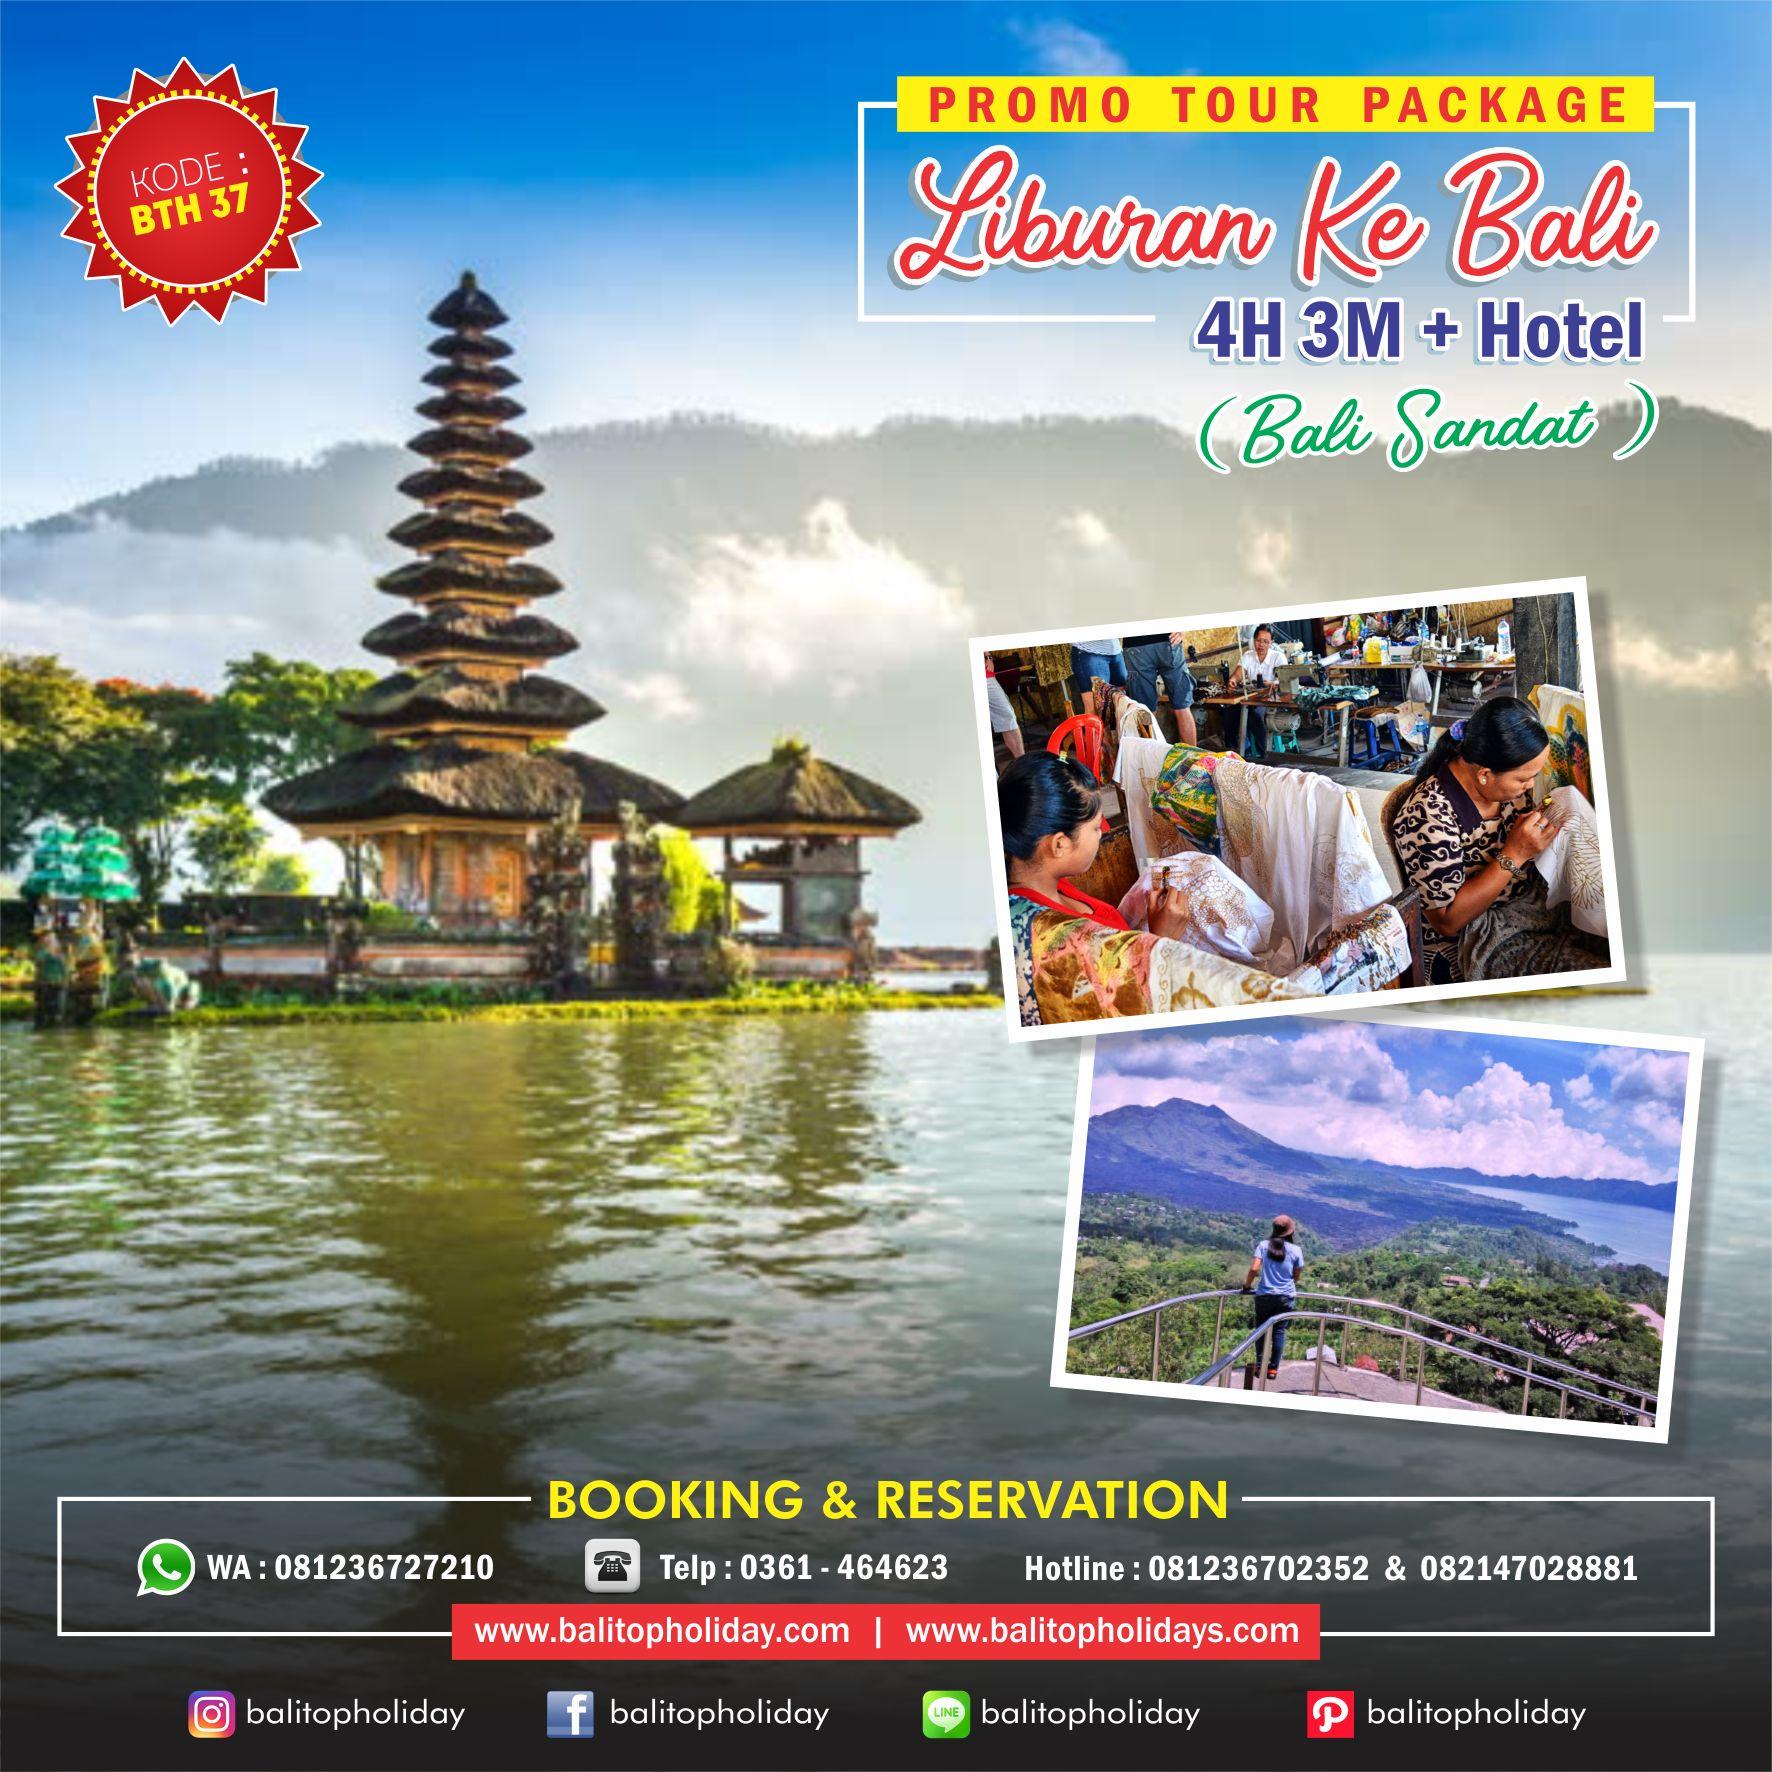 PAKET TOUR 4H 3M BTH 37 Bali Sandat